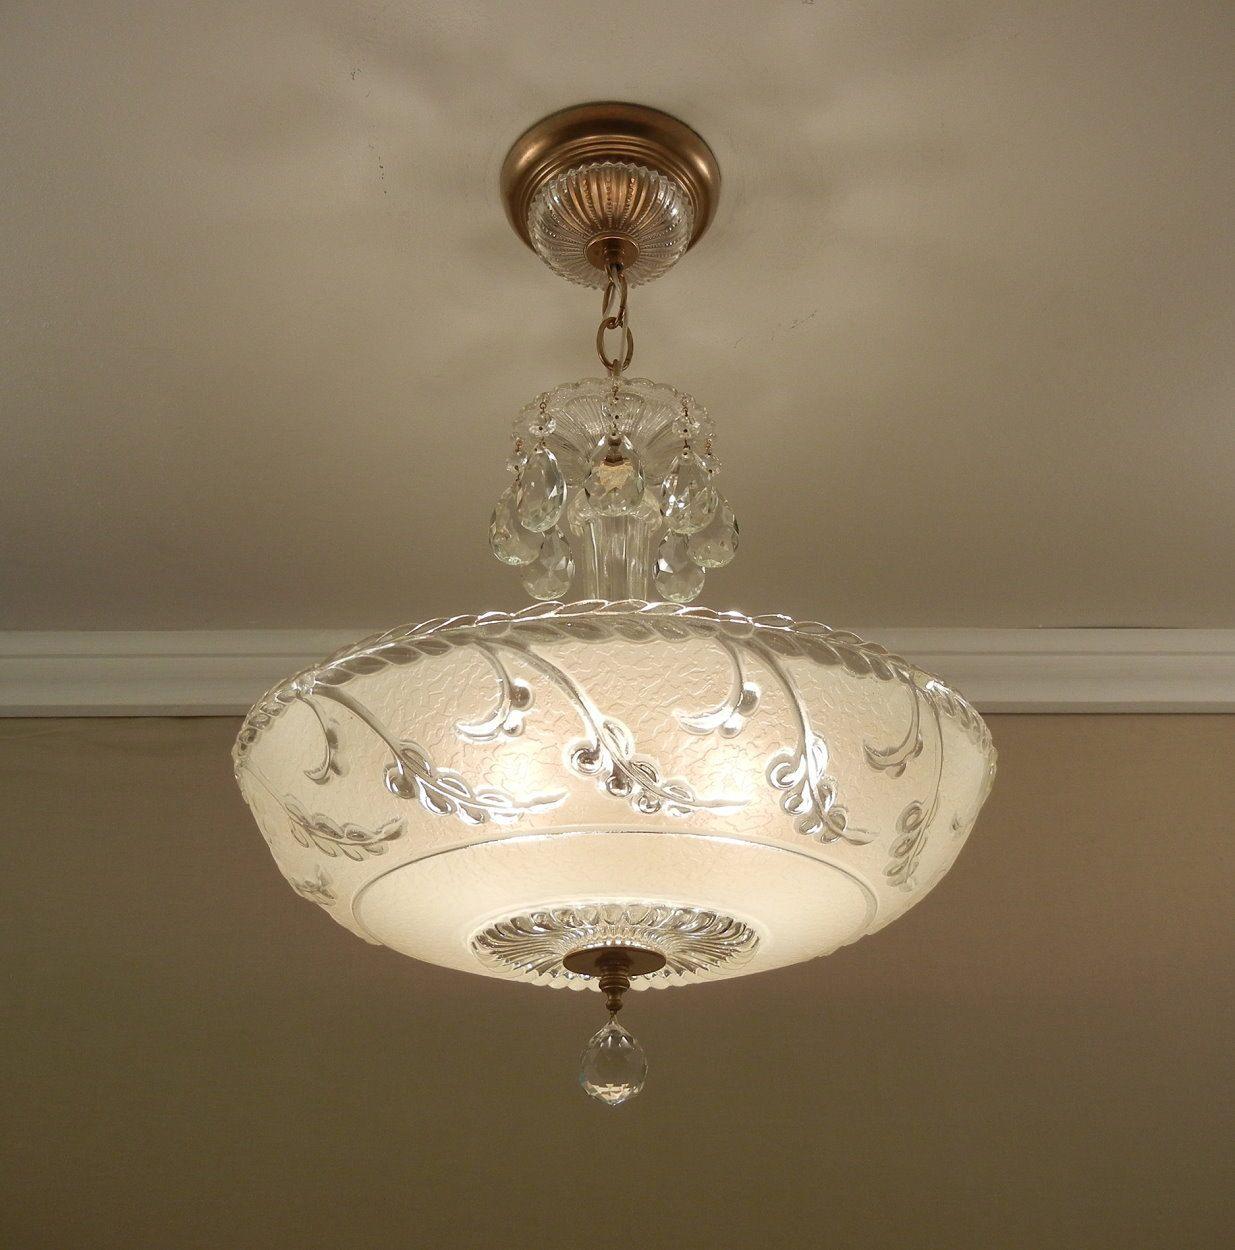 Vintage chandelier 1930s antique nouveau style cream pressed glass ceiling light fixture rewired